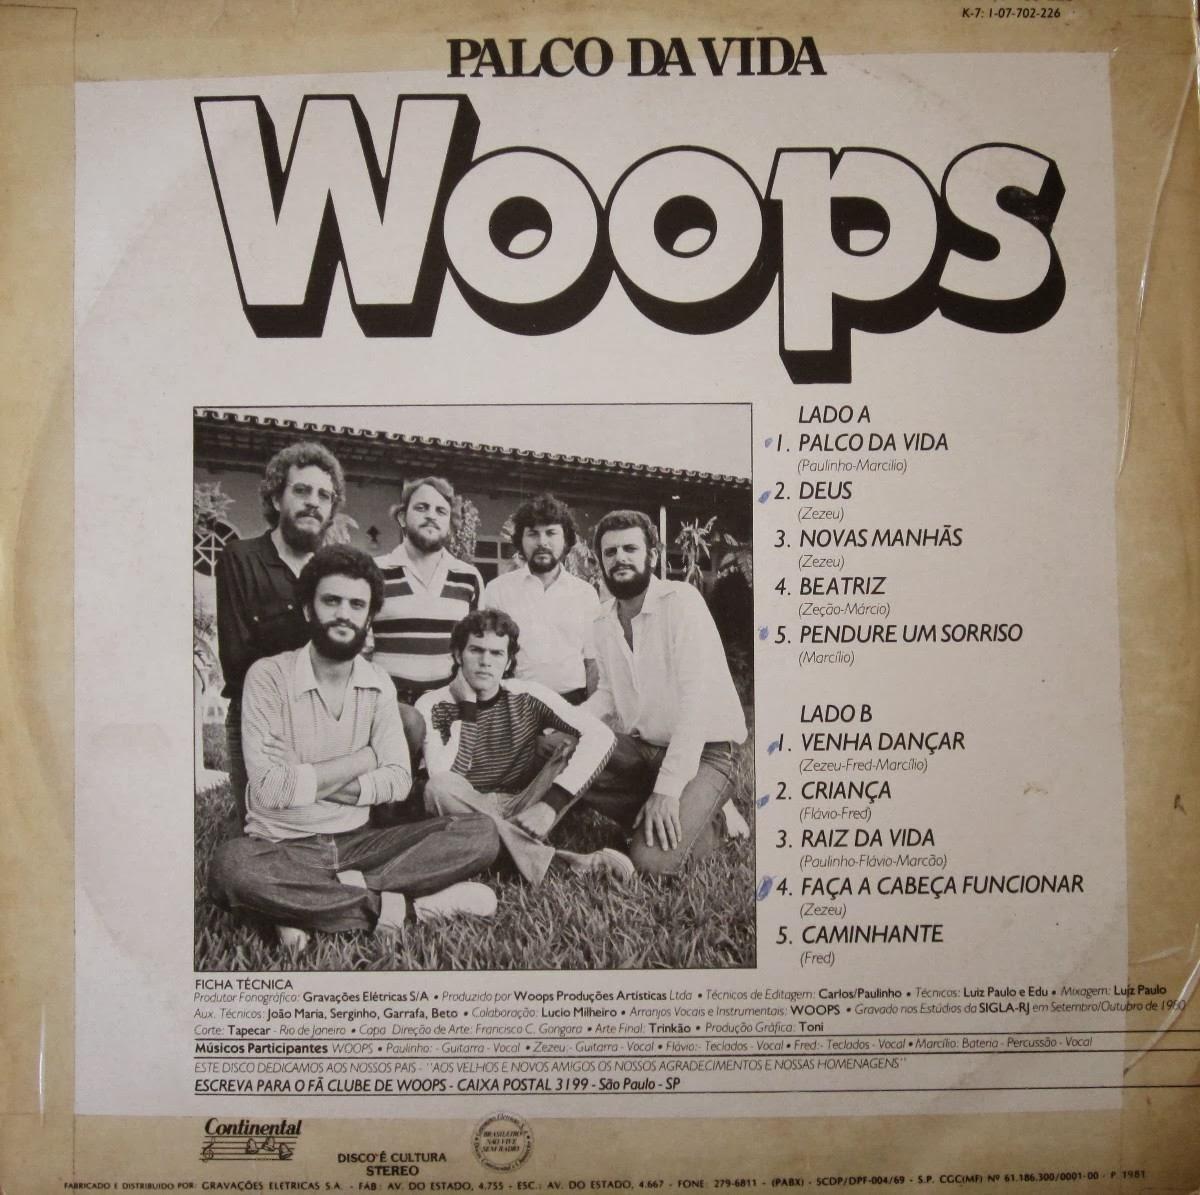 Woops Palco Da Vida